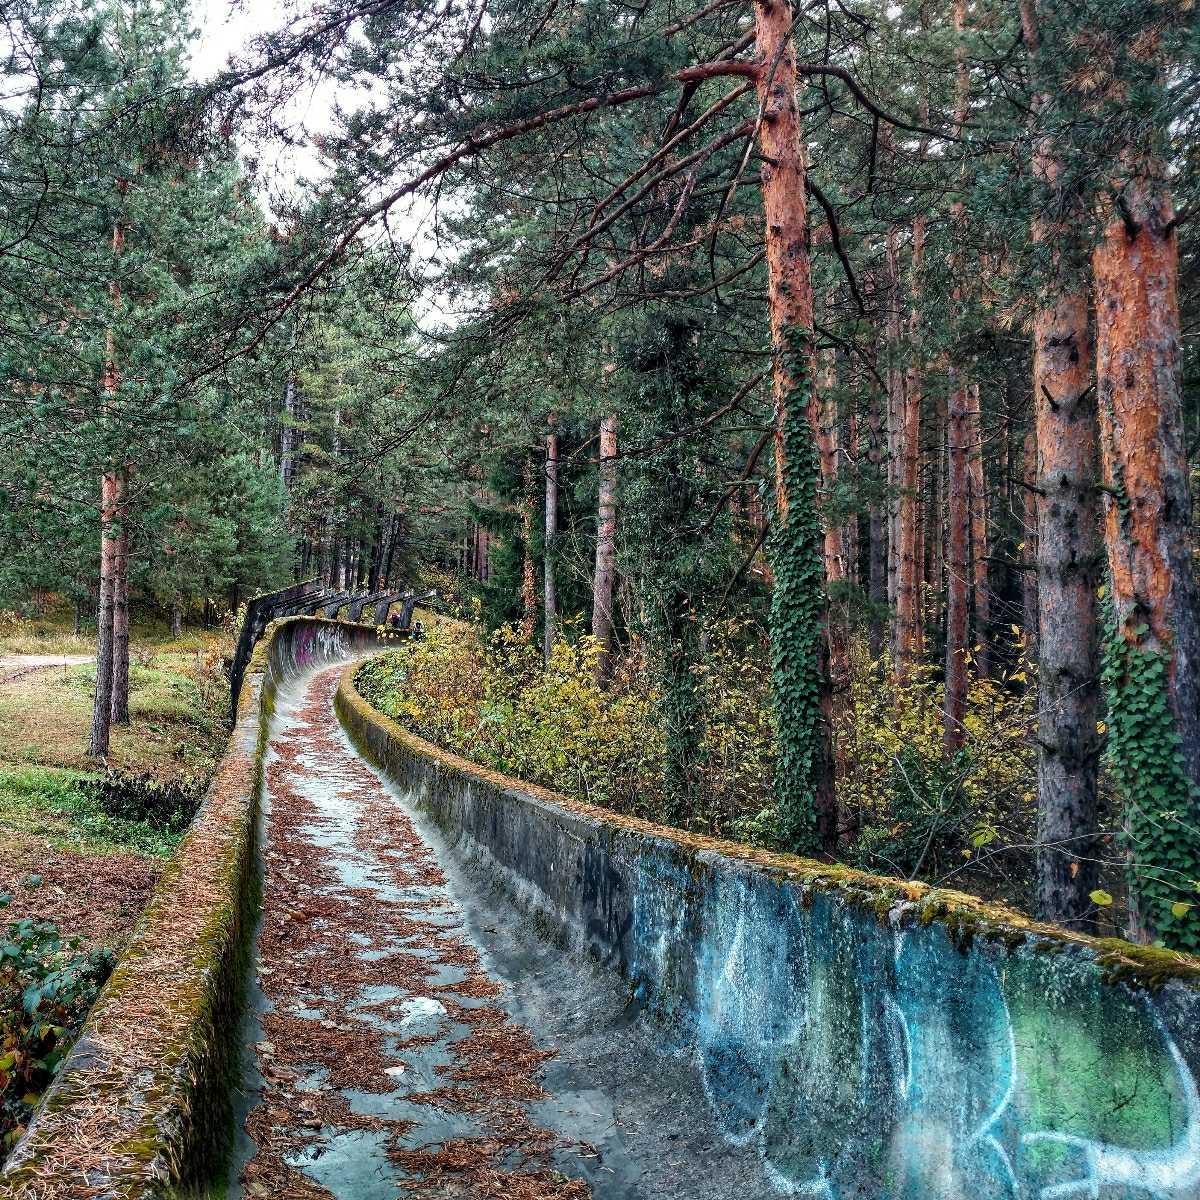 Looking back on November: Hiking Trebević Abandoned Bosbsled Track